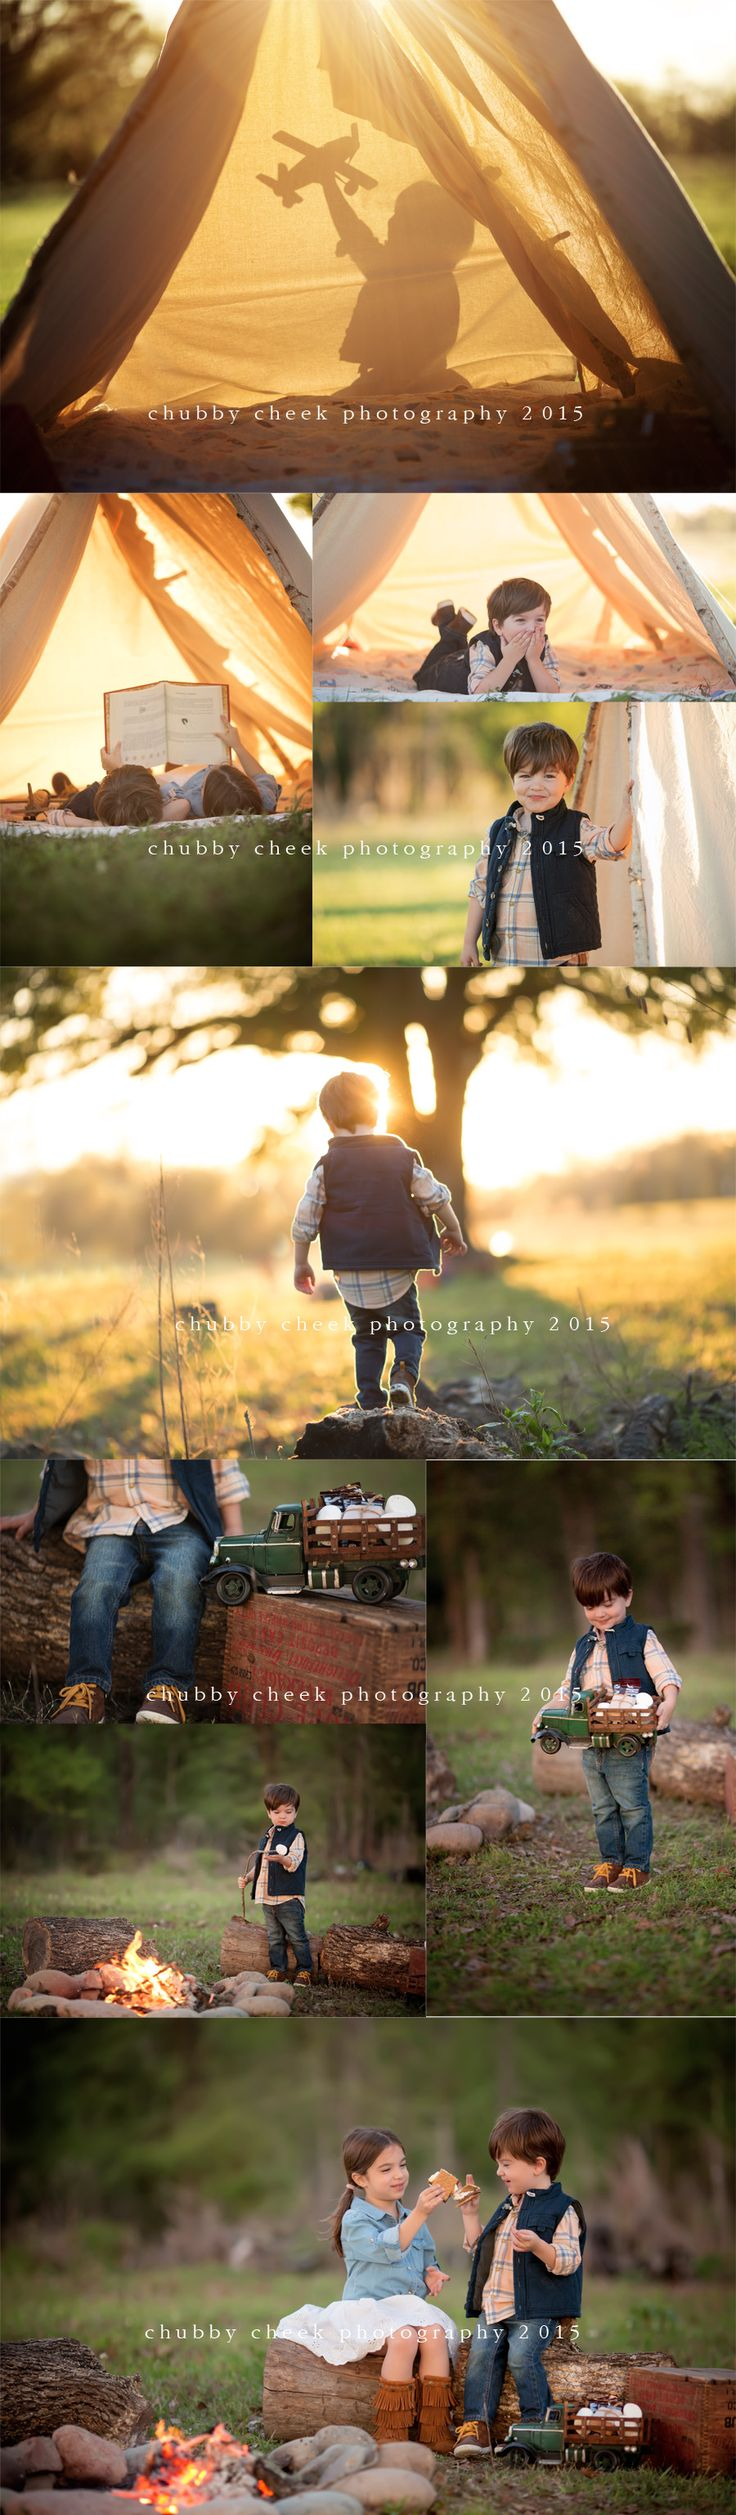 campfire mini parade… the woodlands child photographer